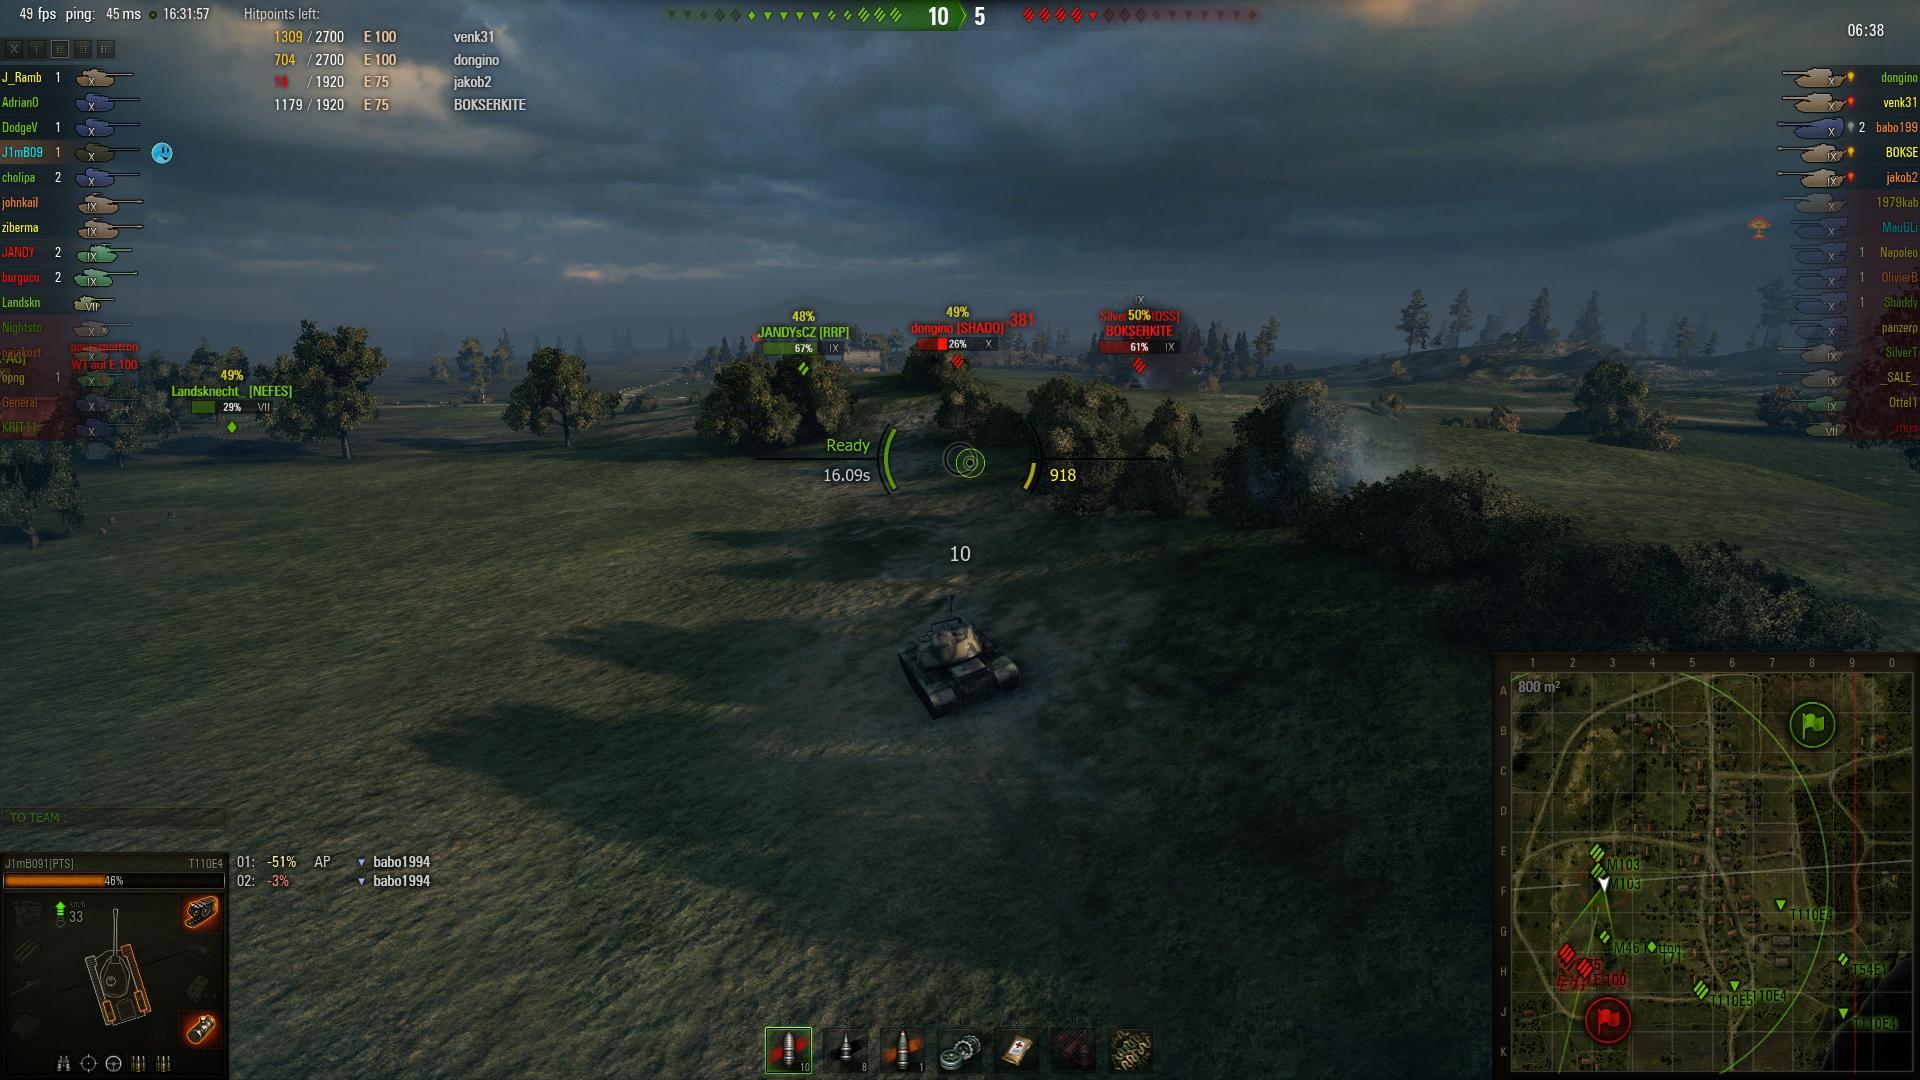 world of tanks xvm mod config